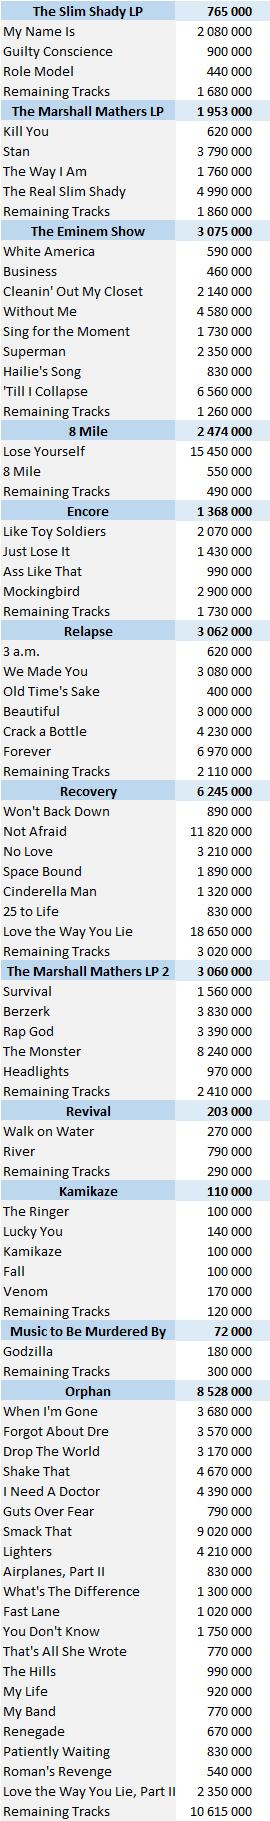 CSPC 2021 Eminem digital singles sales